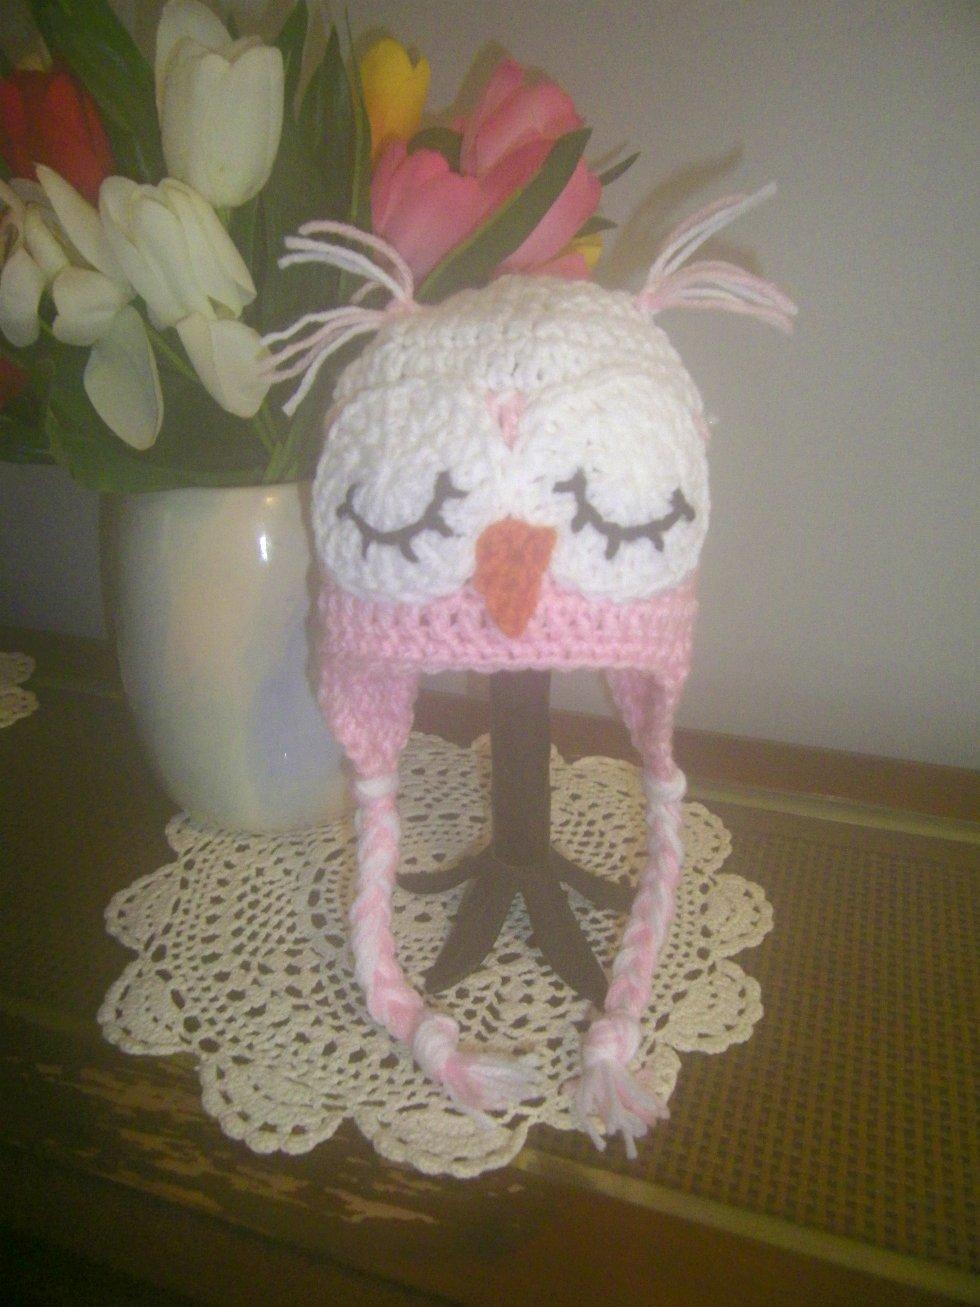 Sleepy Owl Hat Crocheted Hat Winter Hat Baby Size Braid Ties